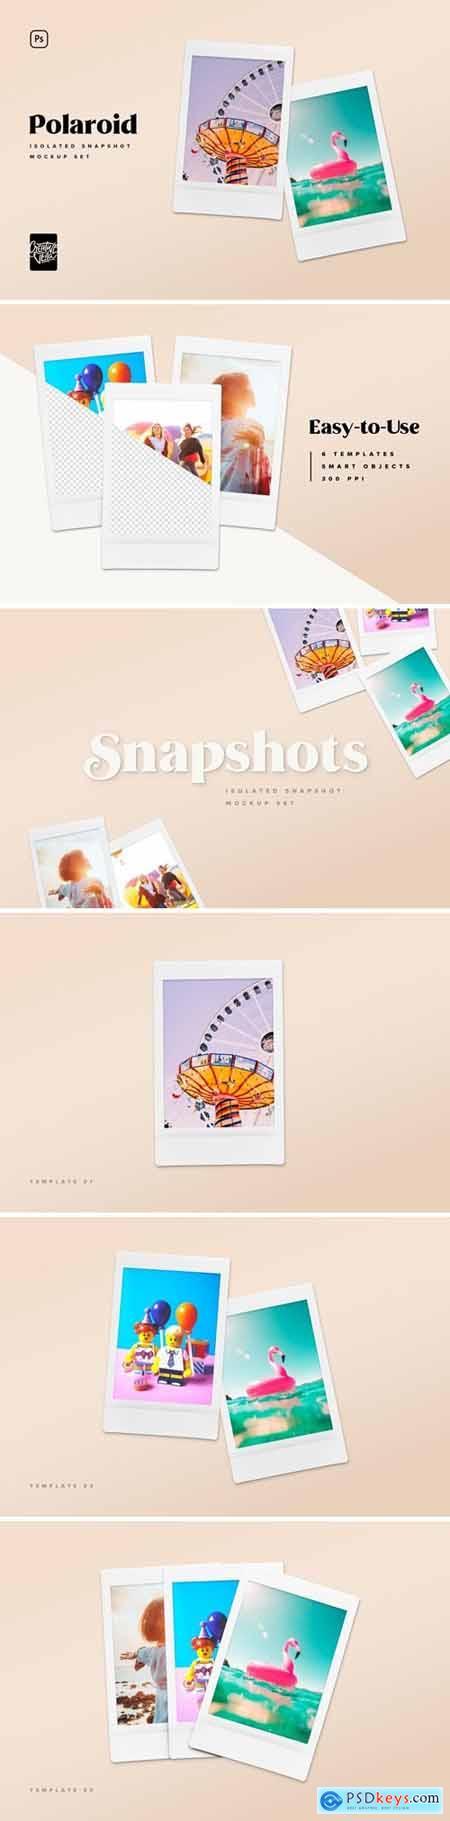 Polaroid Snapshot Picture Mock-ups 5029214